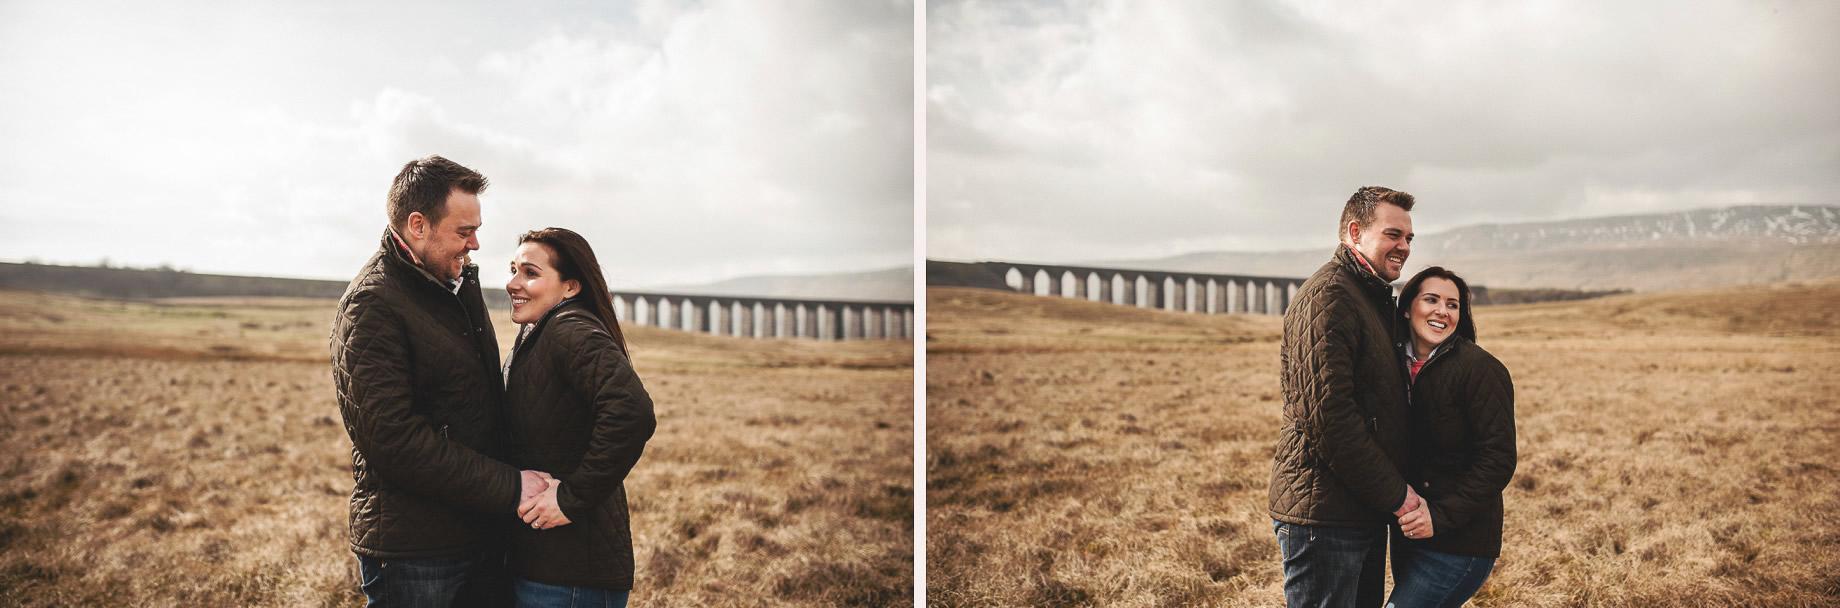 Rachael and Matt's Pre-Wedding Shoot at The Ribblehead Viaduct 015